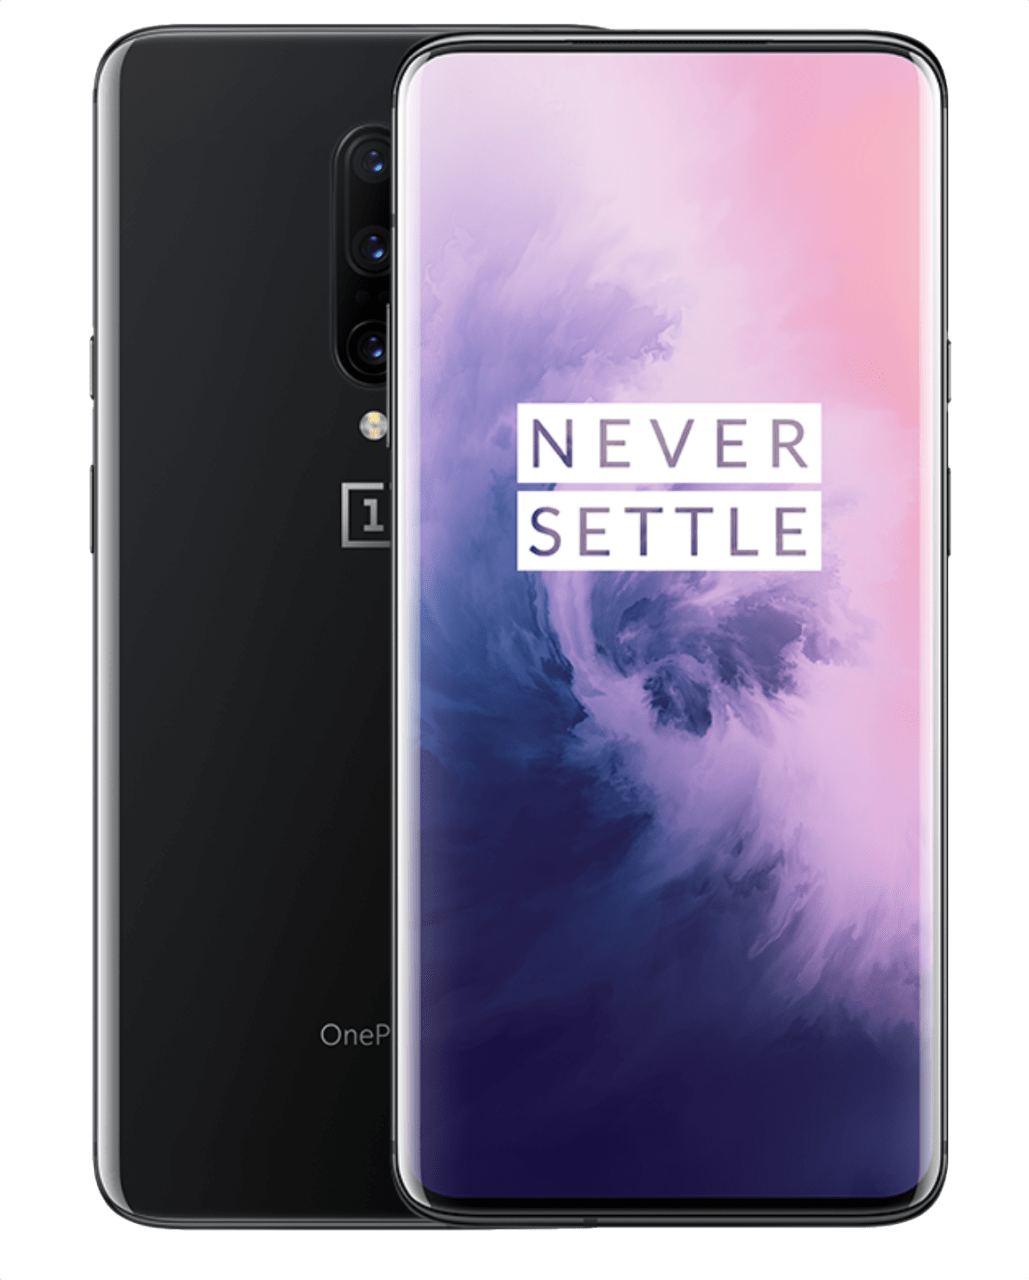 Mirror Gray OnePlus 7 Pro 6GB/128GB.4